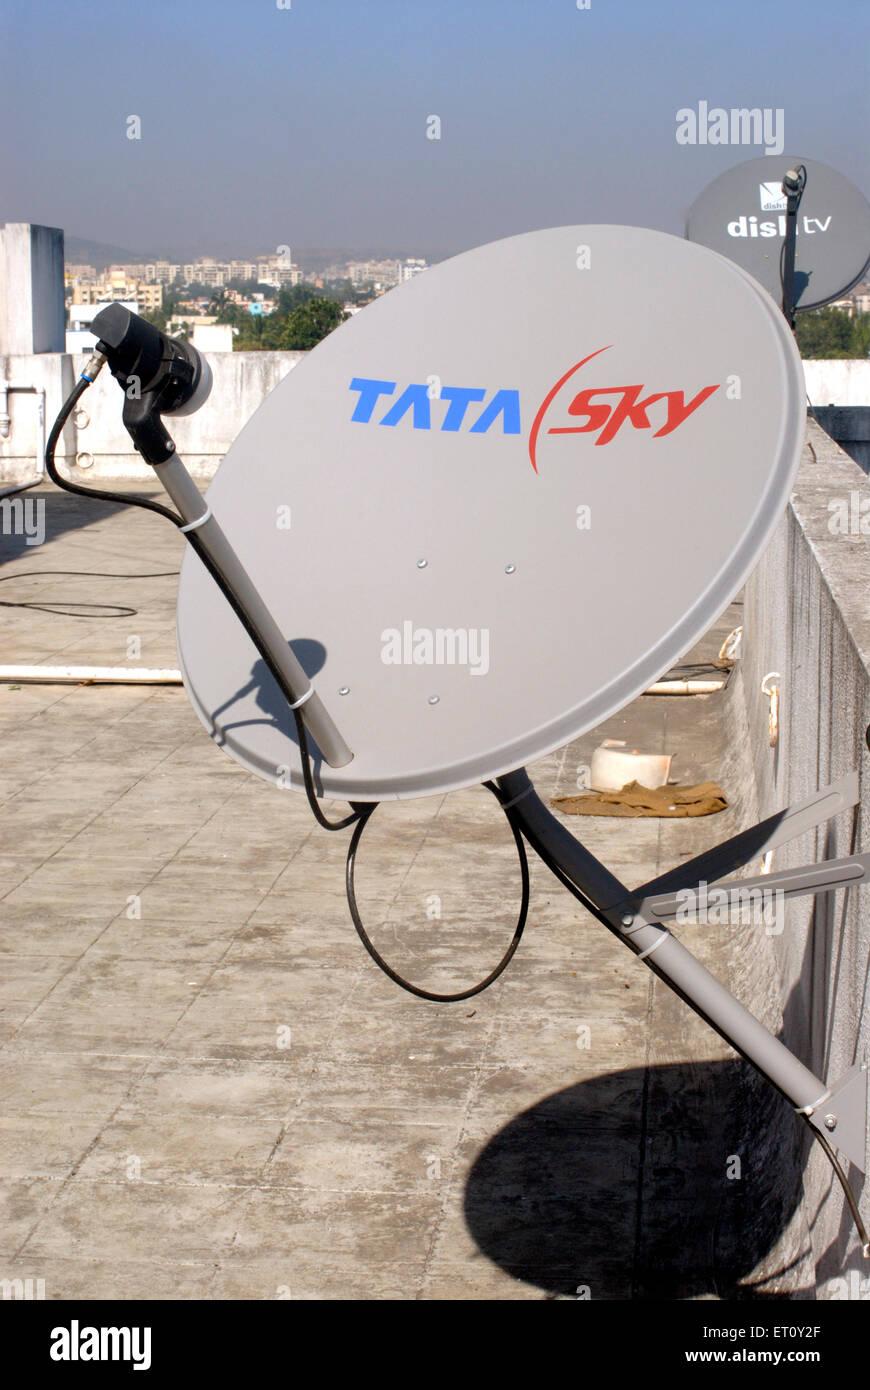 Satellite Tv Stock Photos & Satellite Tv Stock Images - Alamy